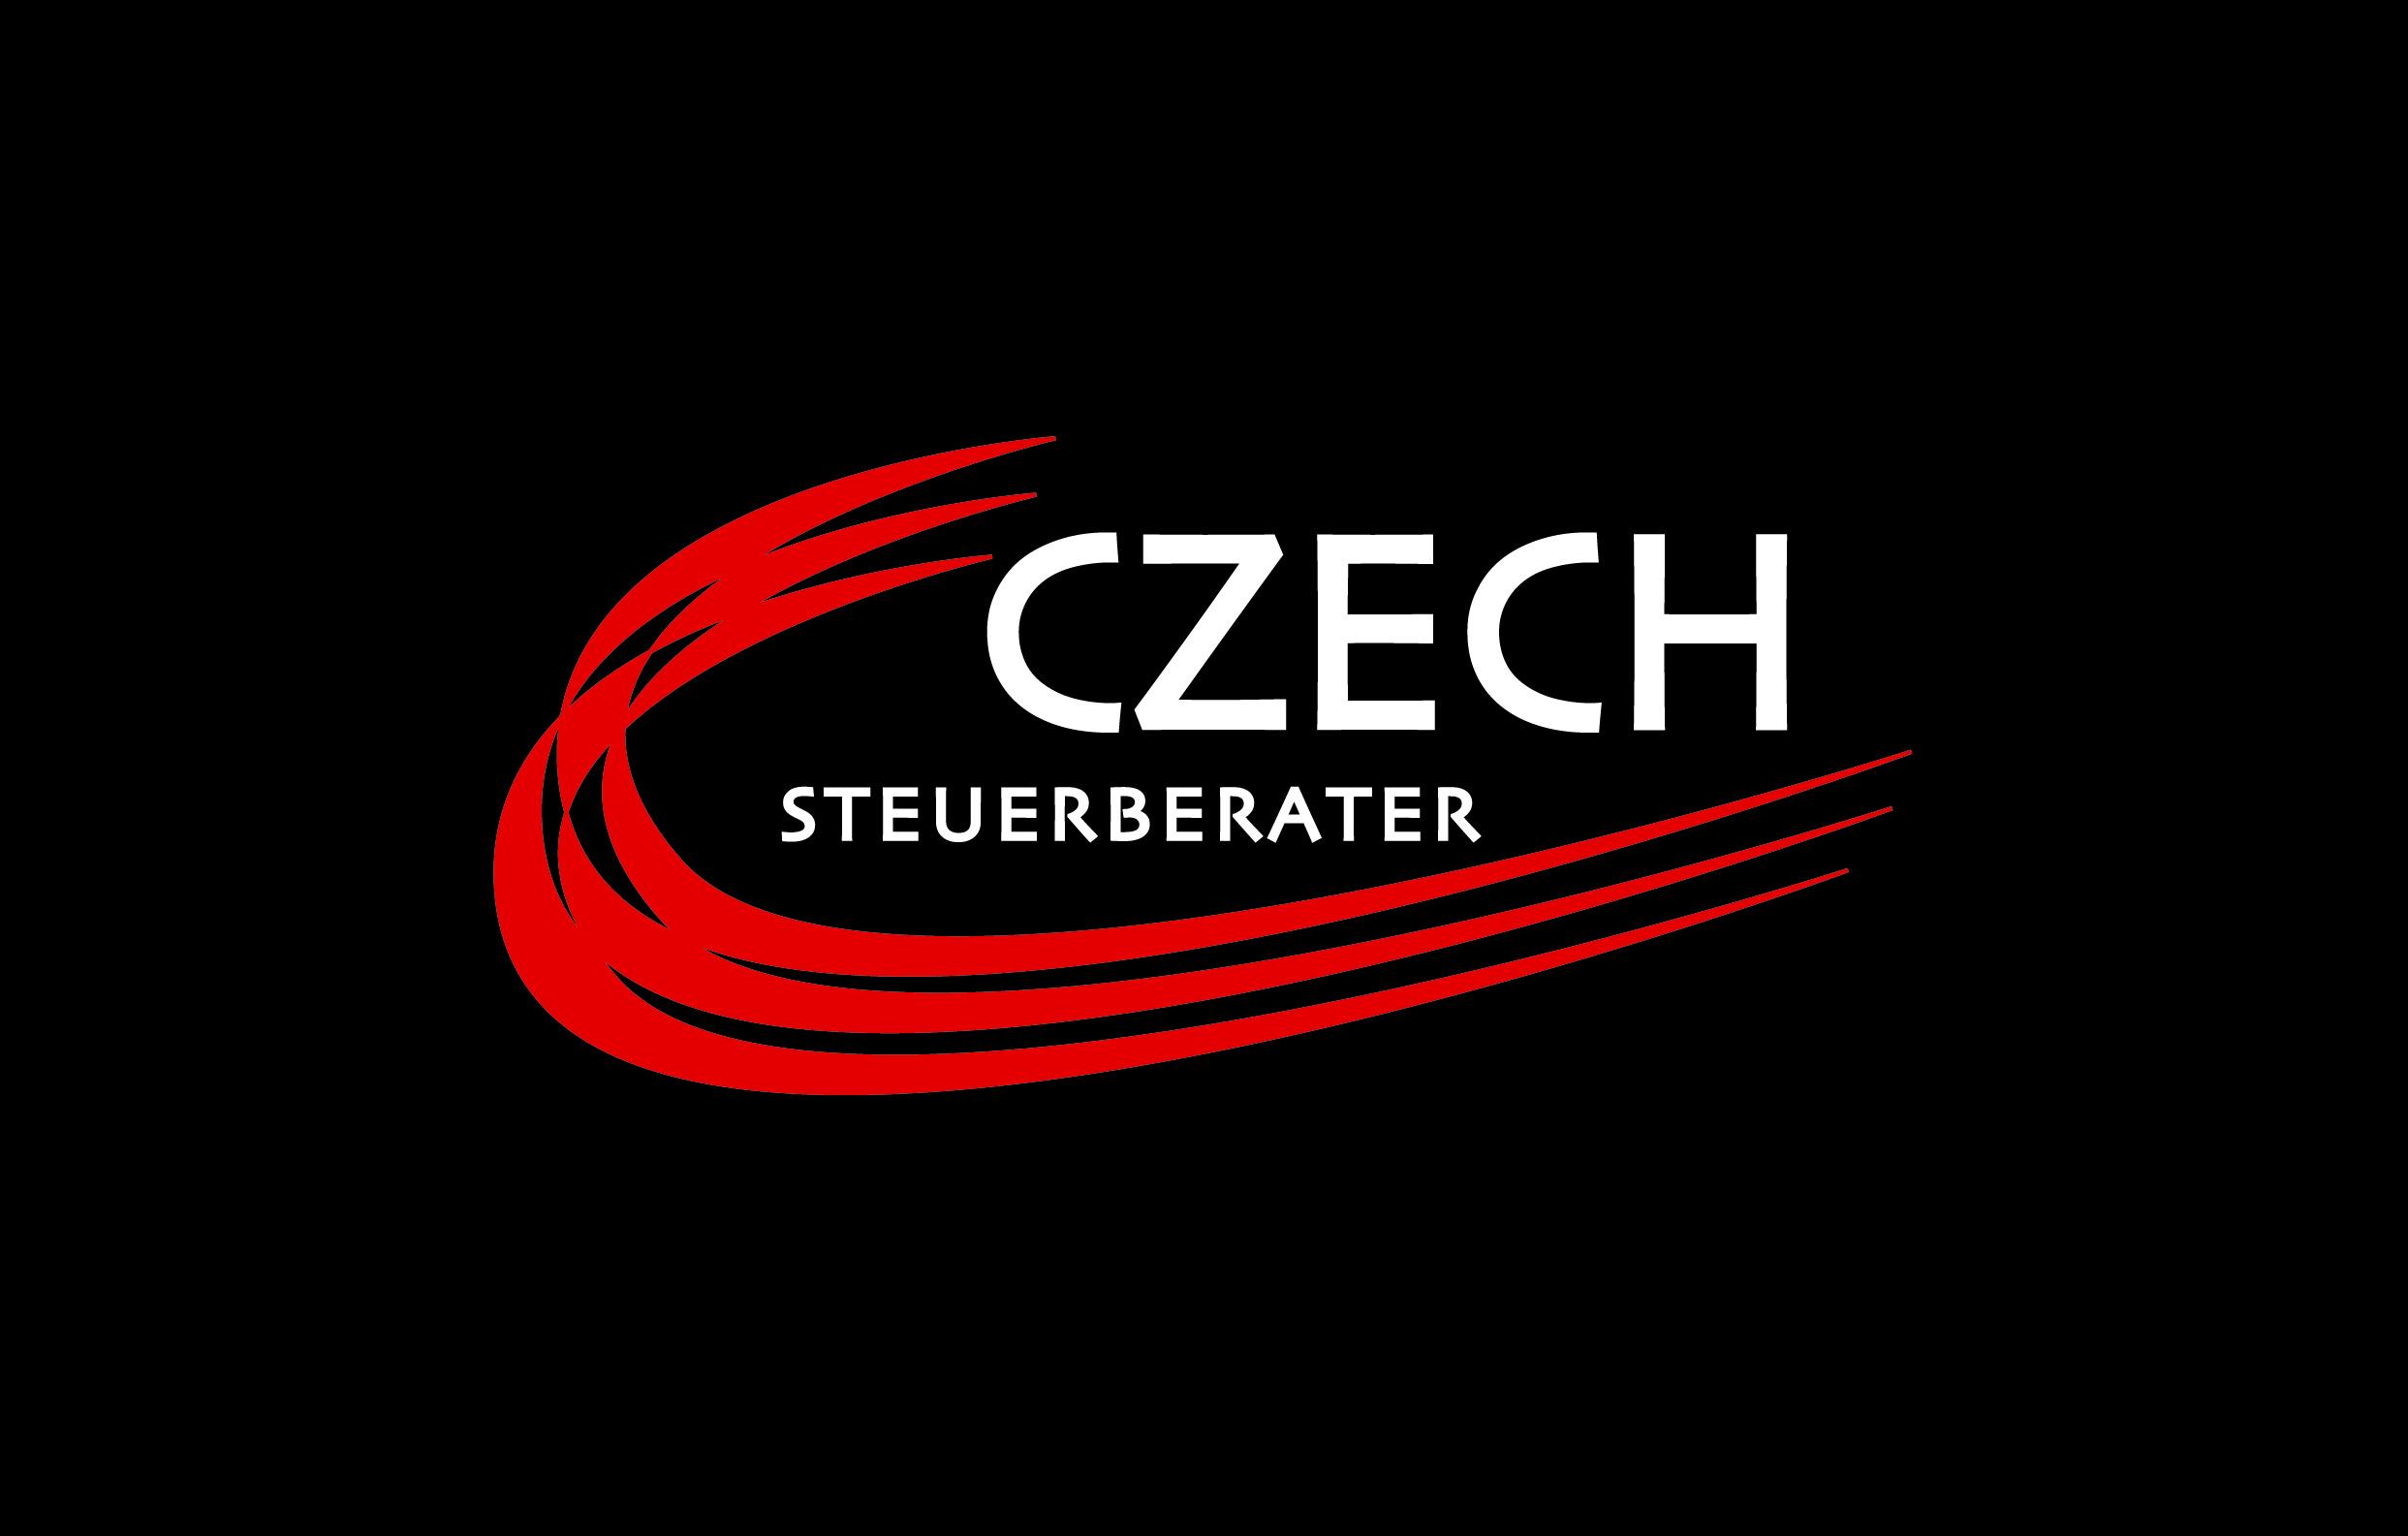 Czech logo white einzel